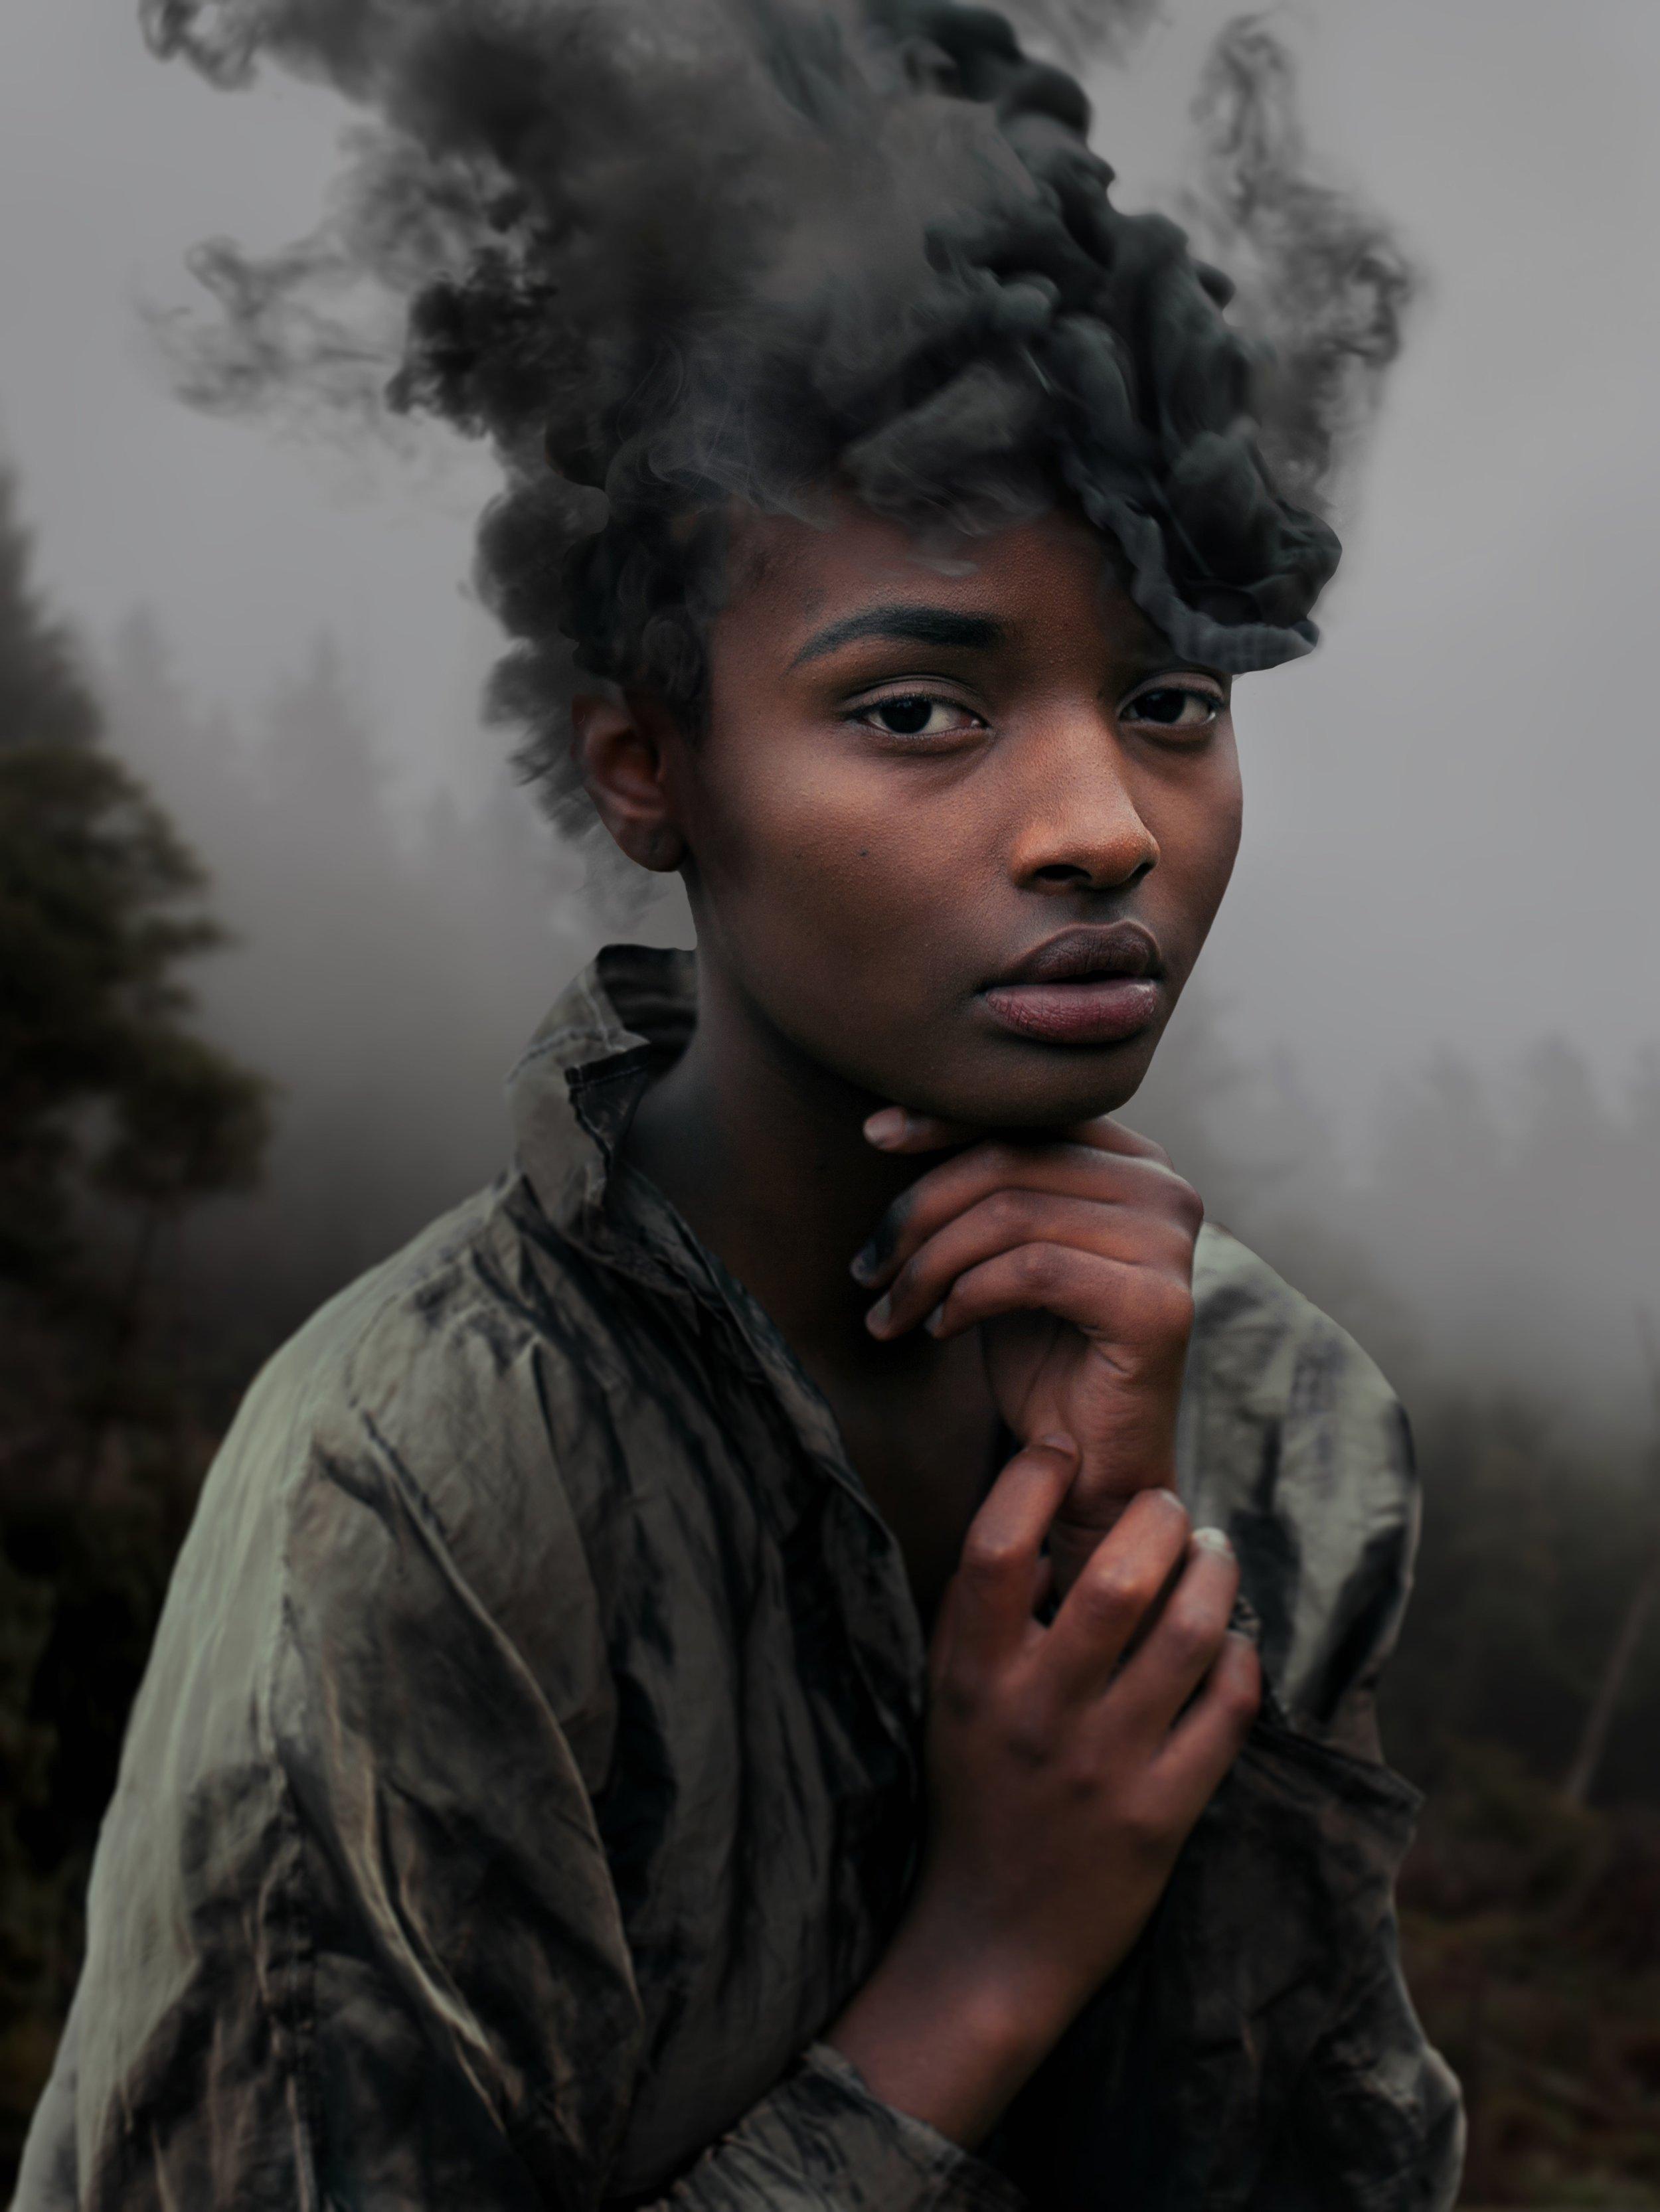 David_Uzochukwu - Wildfire.jpg